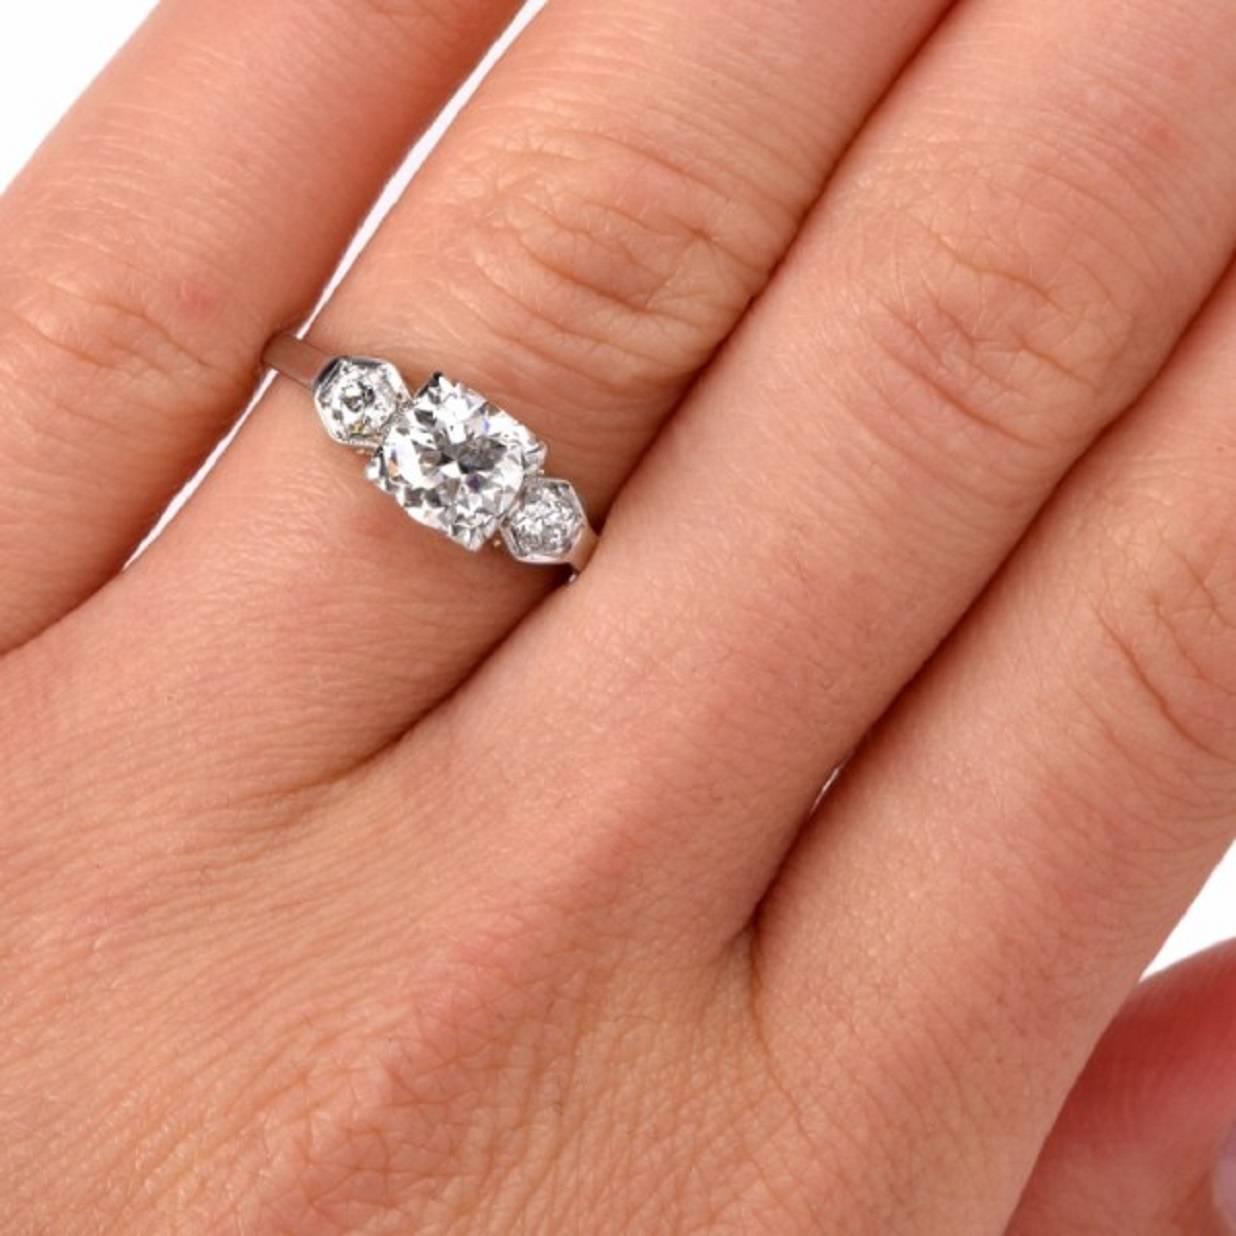 115 Carat European Cut Diamond Gold Engagement Ring At. $60000 Engagement Rings. Estate Engagement Rings. Trinity Rings. 3 Cord Wedding Rings. Red Heart Engagement Rings. Jeulia Rings. Newborn Photography Wedding Rings. Growth Rings